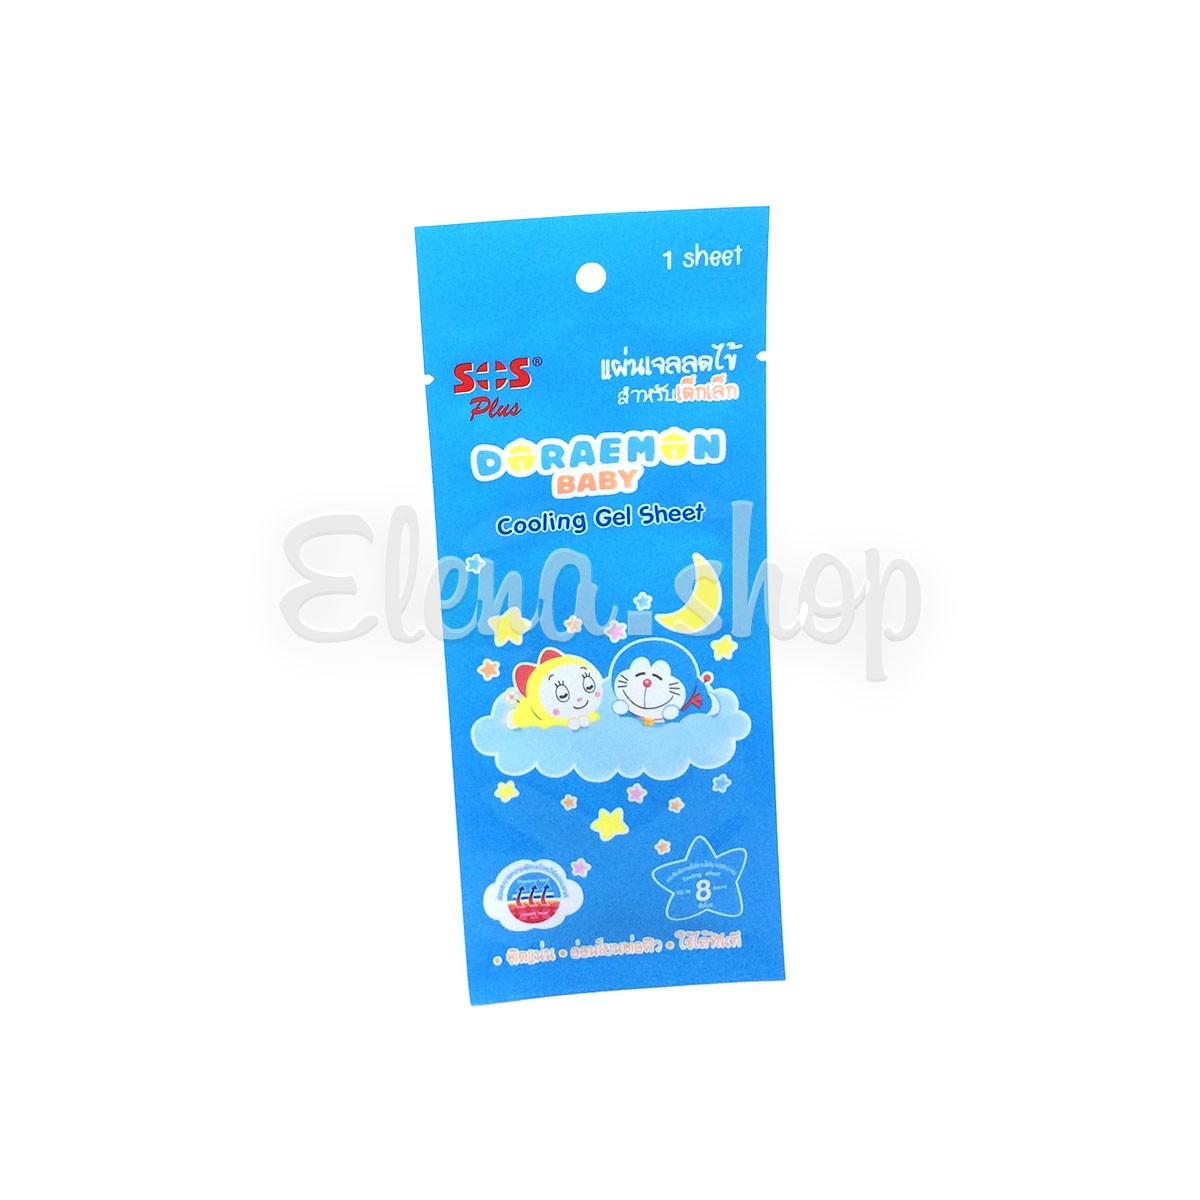 Охлаждающий пластырь для детей Doraemon Baby